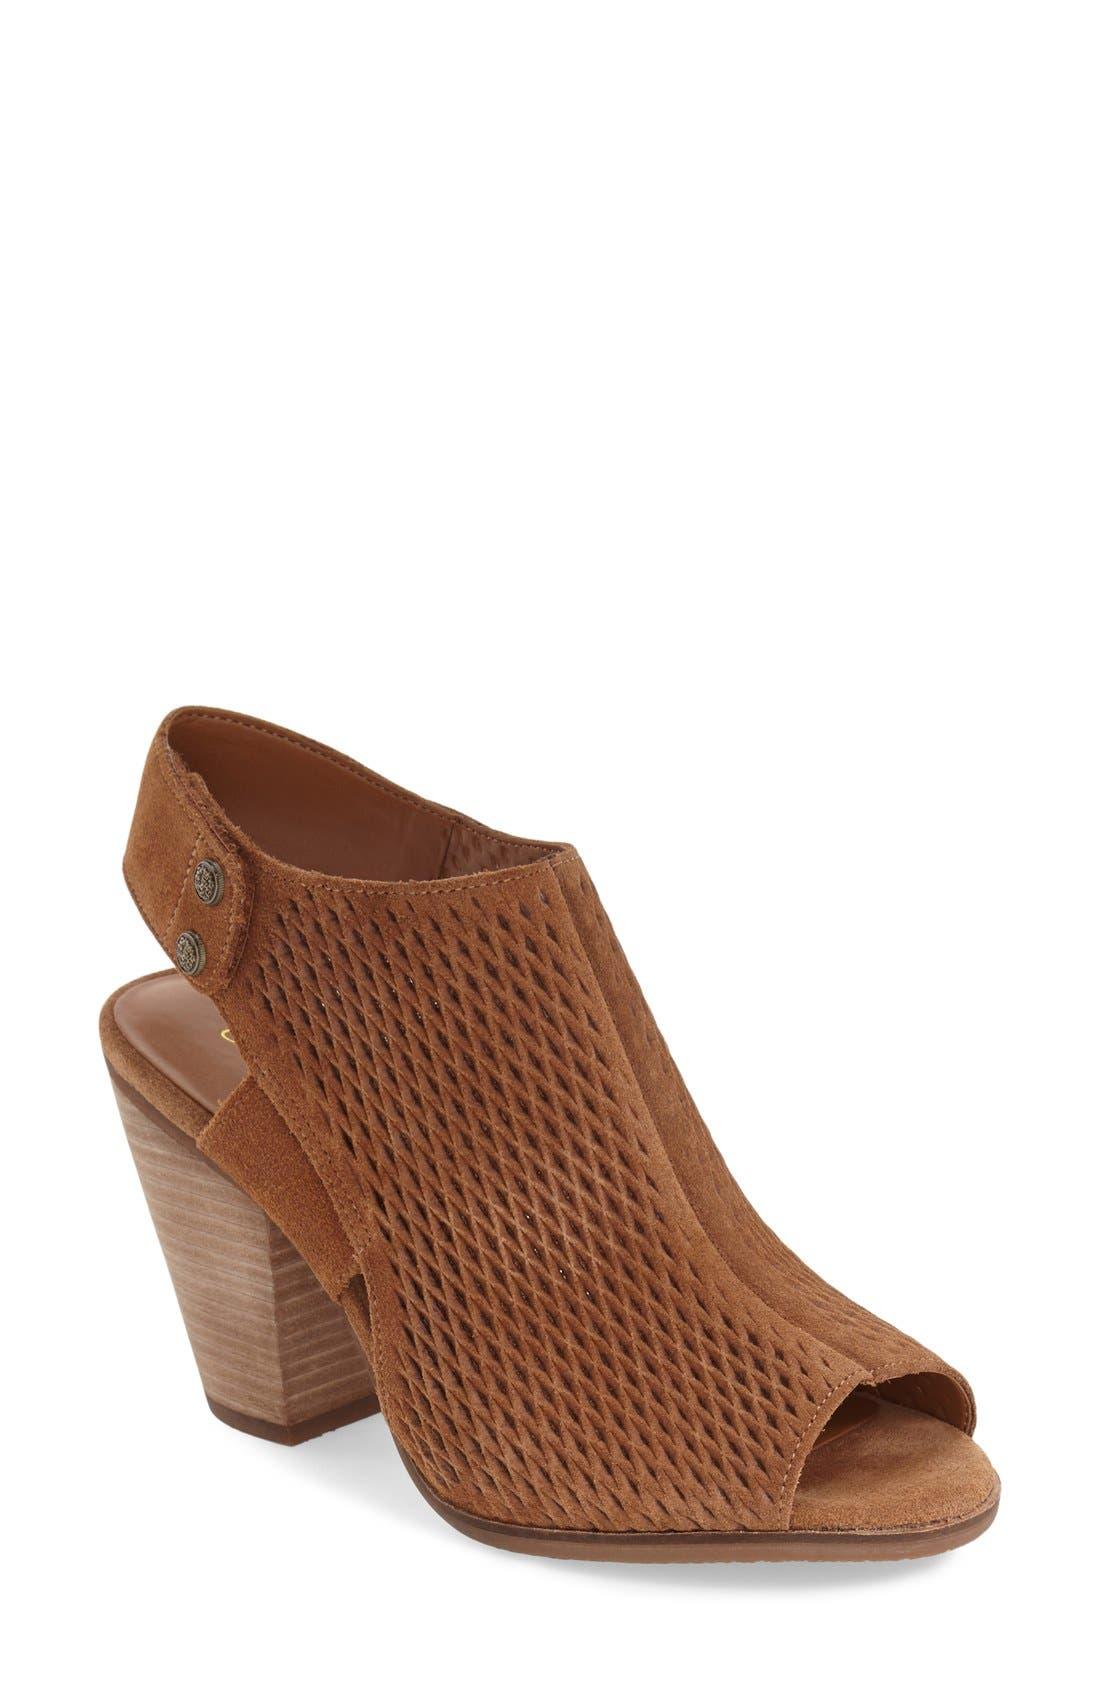 Arturo Chiang 'Janel' Perforated Slingback Sandal (Women)